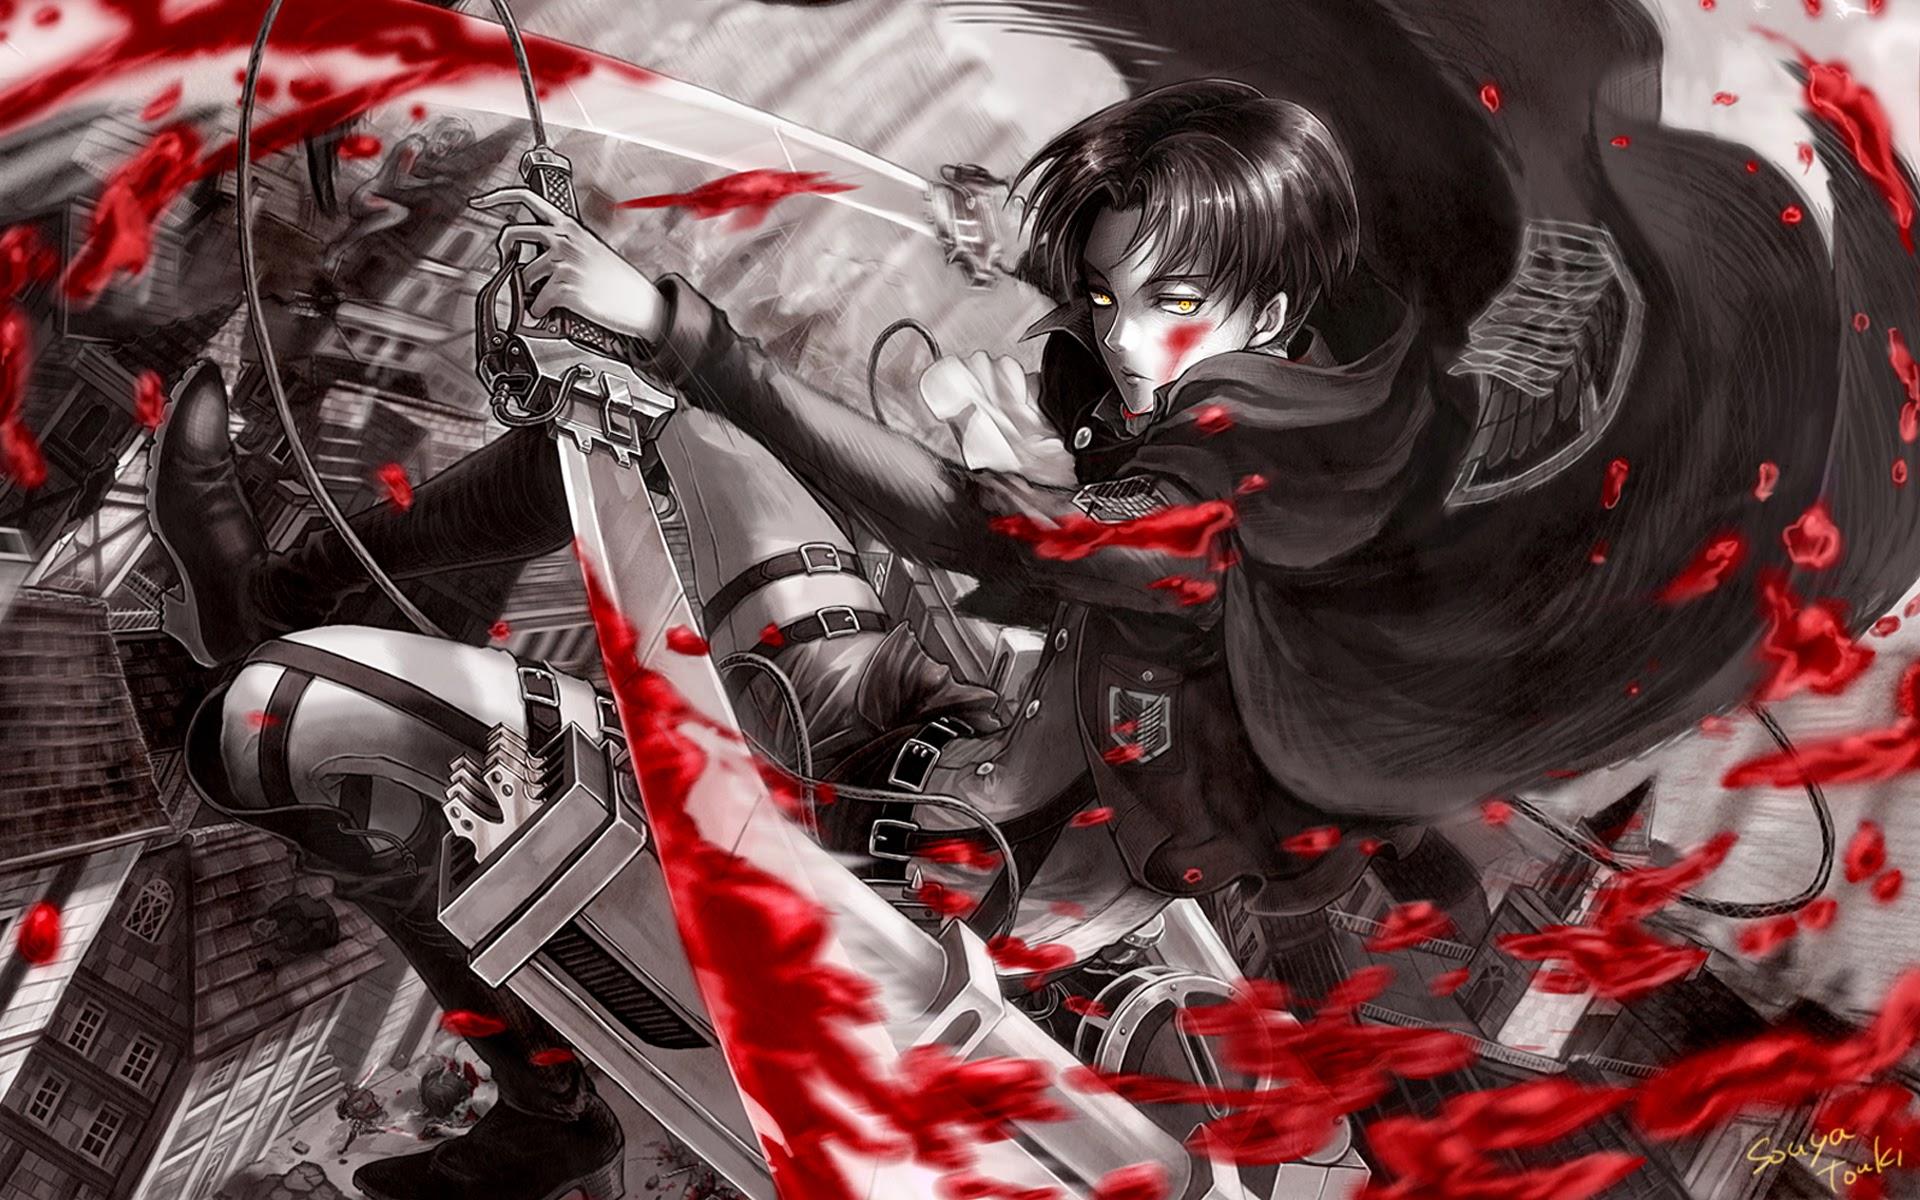 levi anime attack on titan shingeki no kyojin hd wallpaper 1920x1200 1920x1200